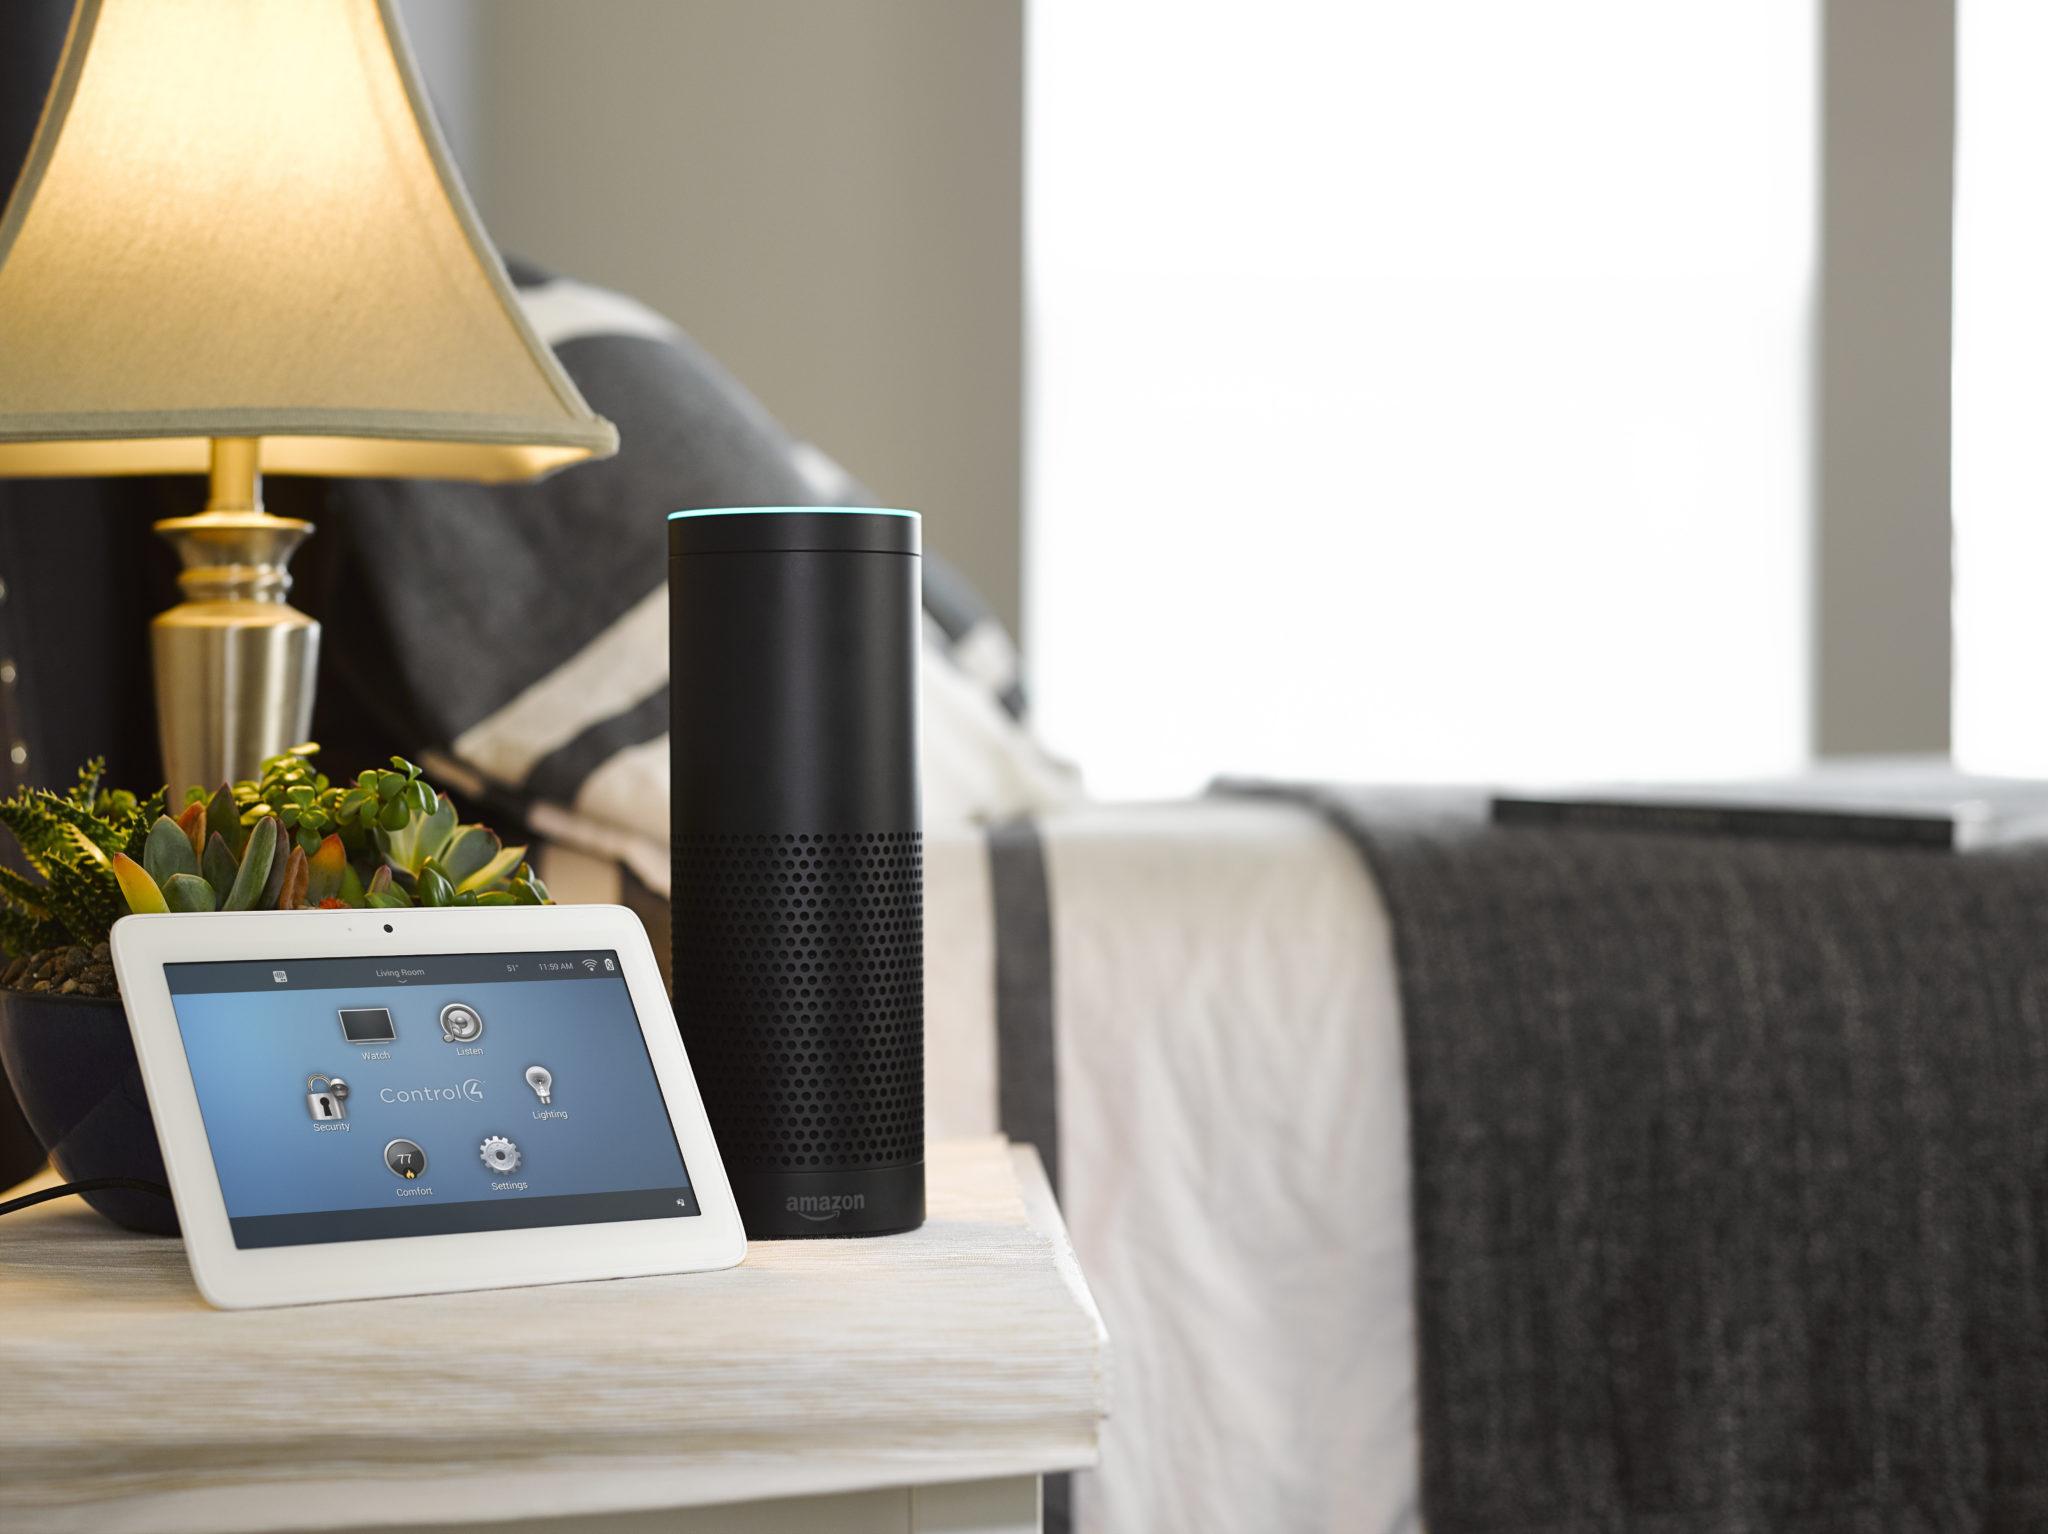 Smart Home - Wireless Networking